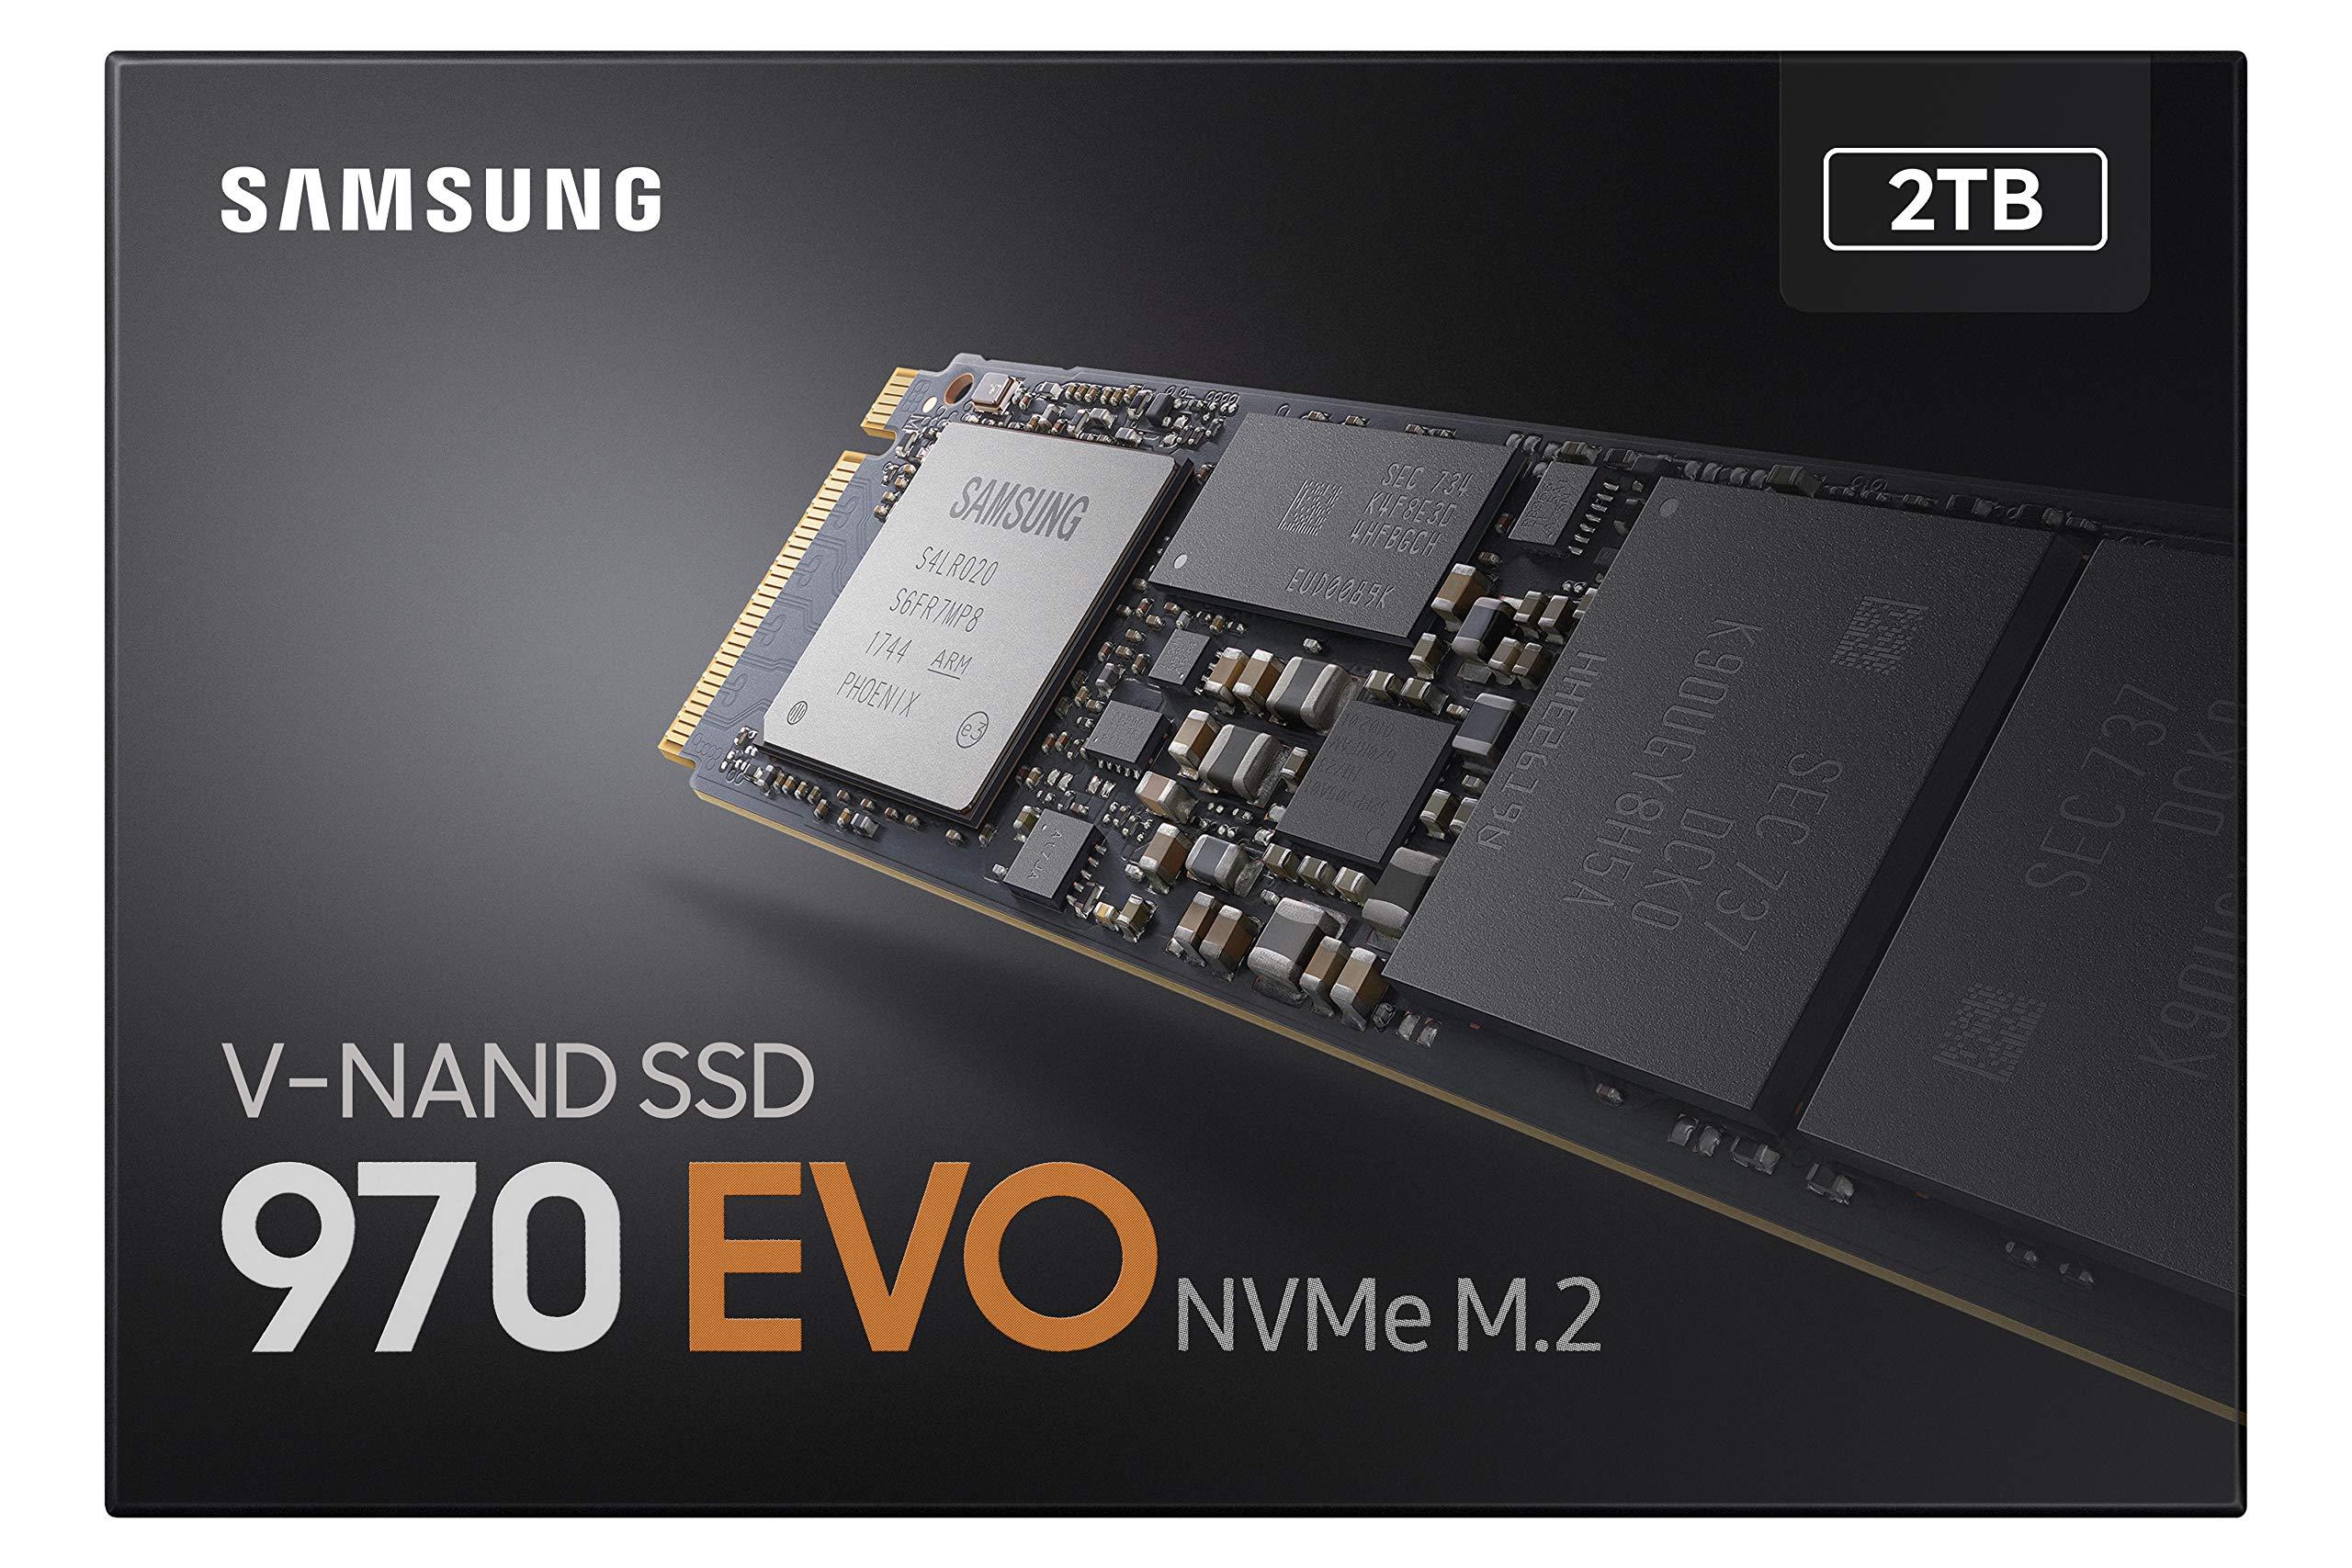 Samsung SSD 970 EVO 2TB - NVMe PCIe M.2 2280 SSD (MZ-V7E2T0BW) by Samsung (Image #10)